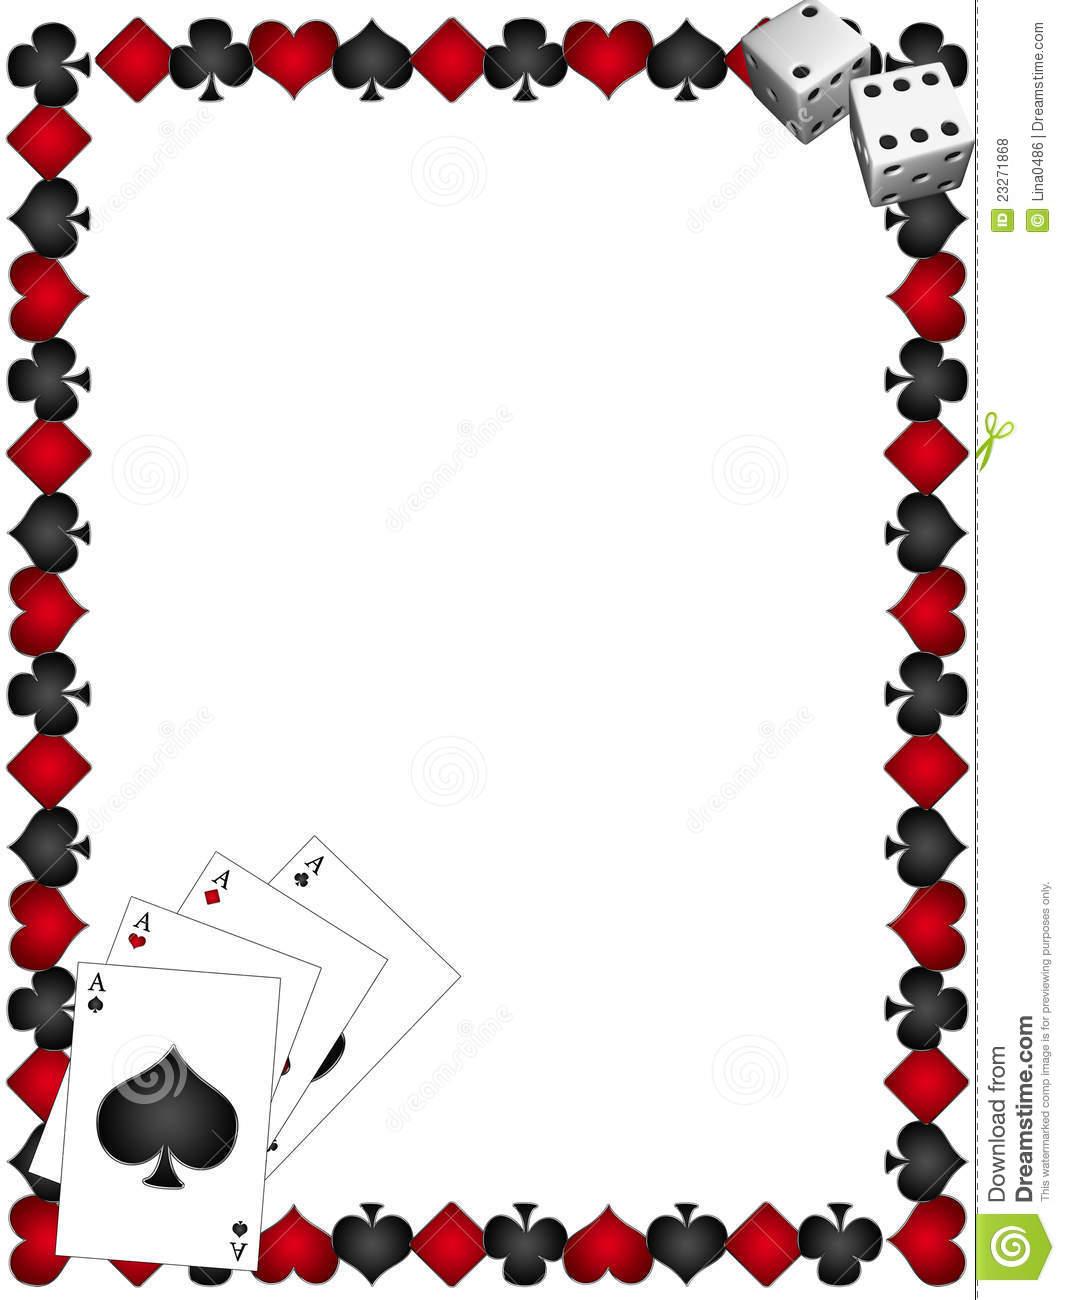 Dice clipart rolled Clipart borders Casino clipart clip